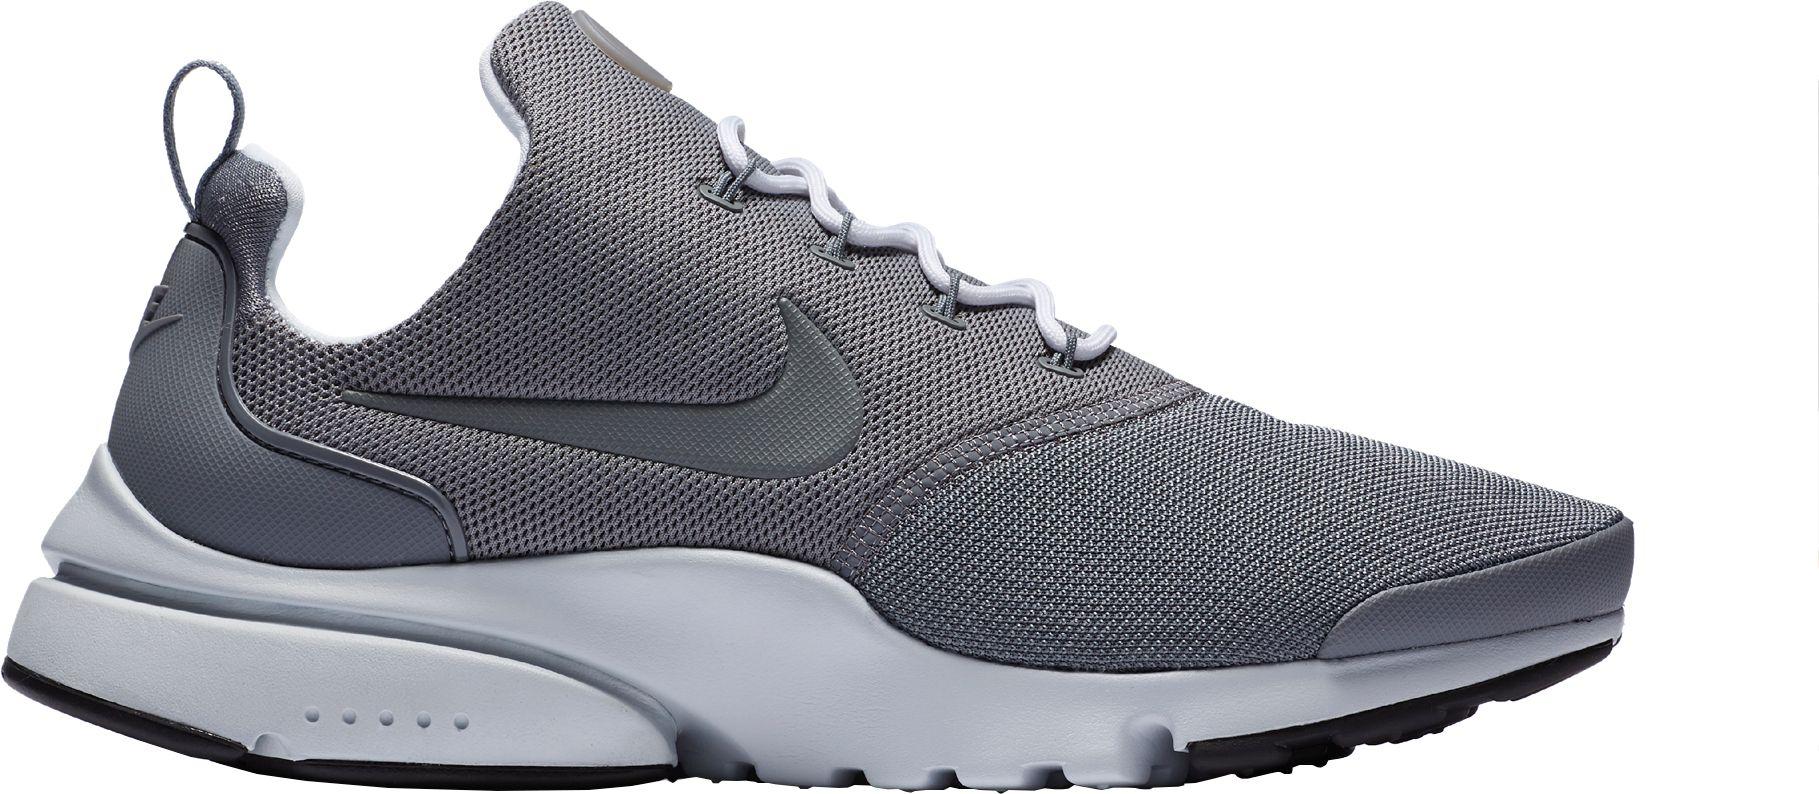 Nike Menu0027s Presto Fly Shoes | DICKu0027S Sporting Goods